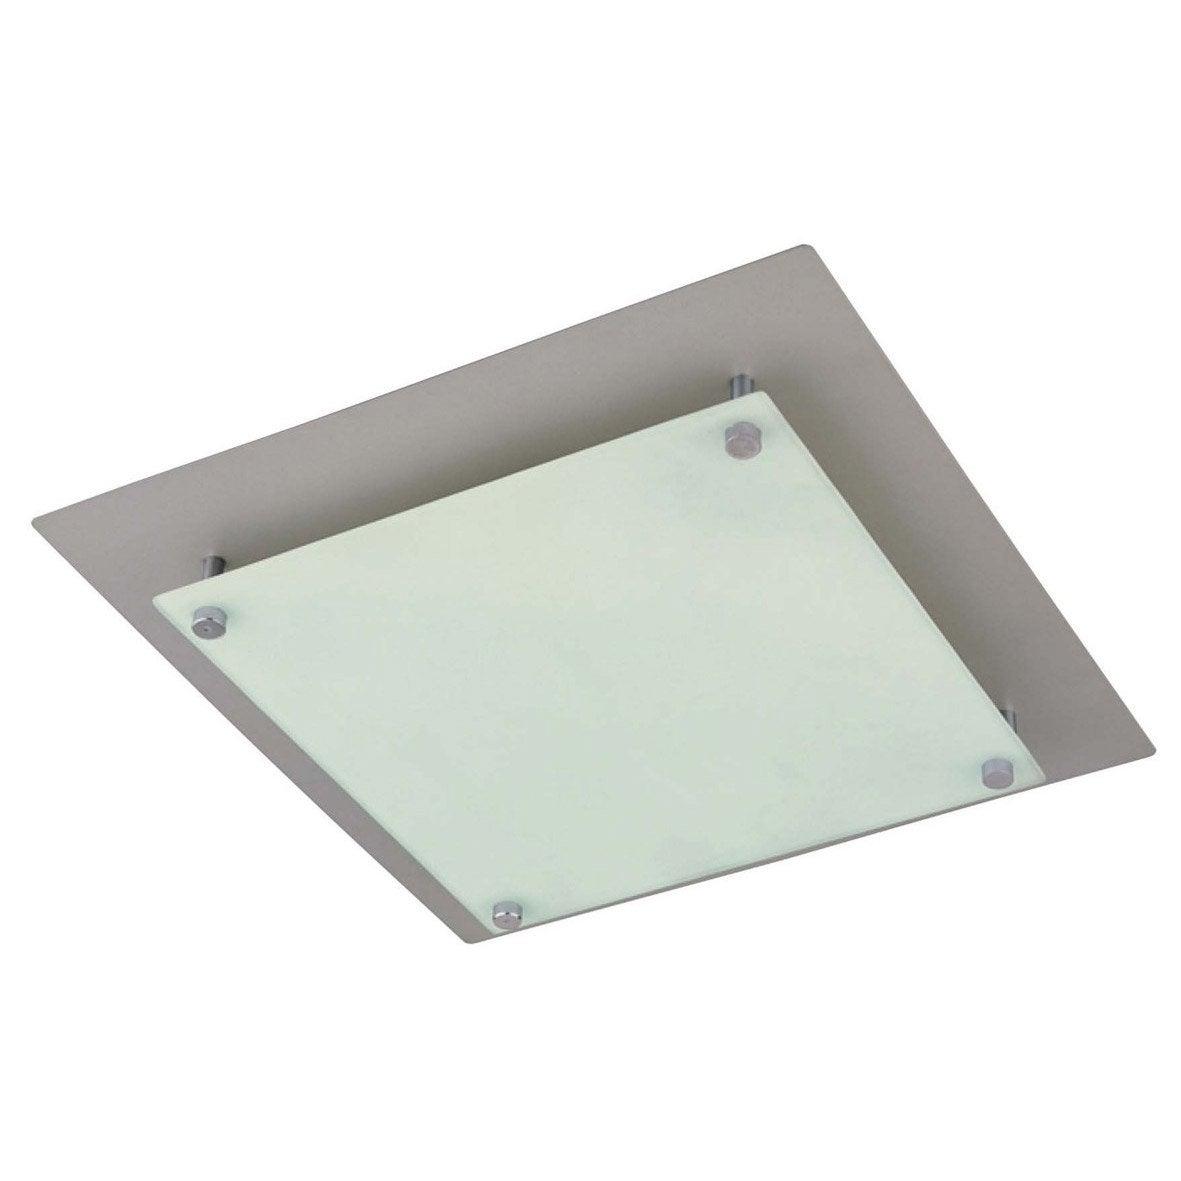 Plafonnier koll aluminium 60 watts leroy merlin - Platte aluminium leroy merlin ...